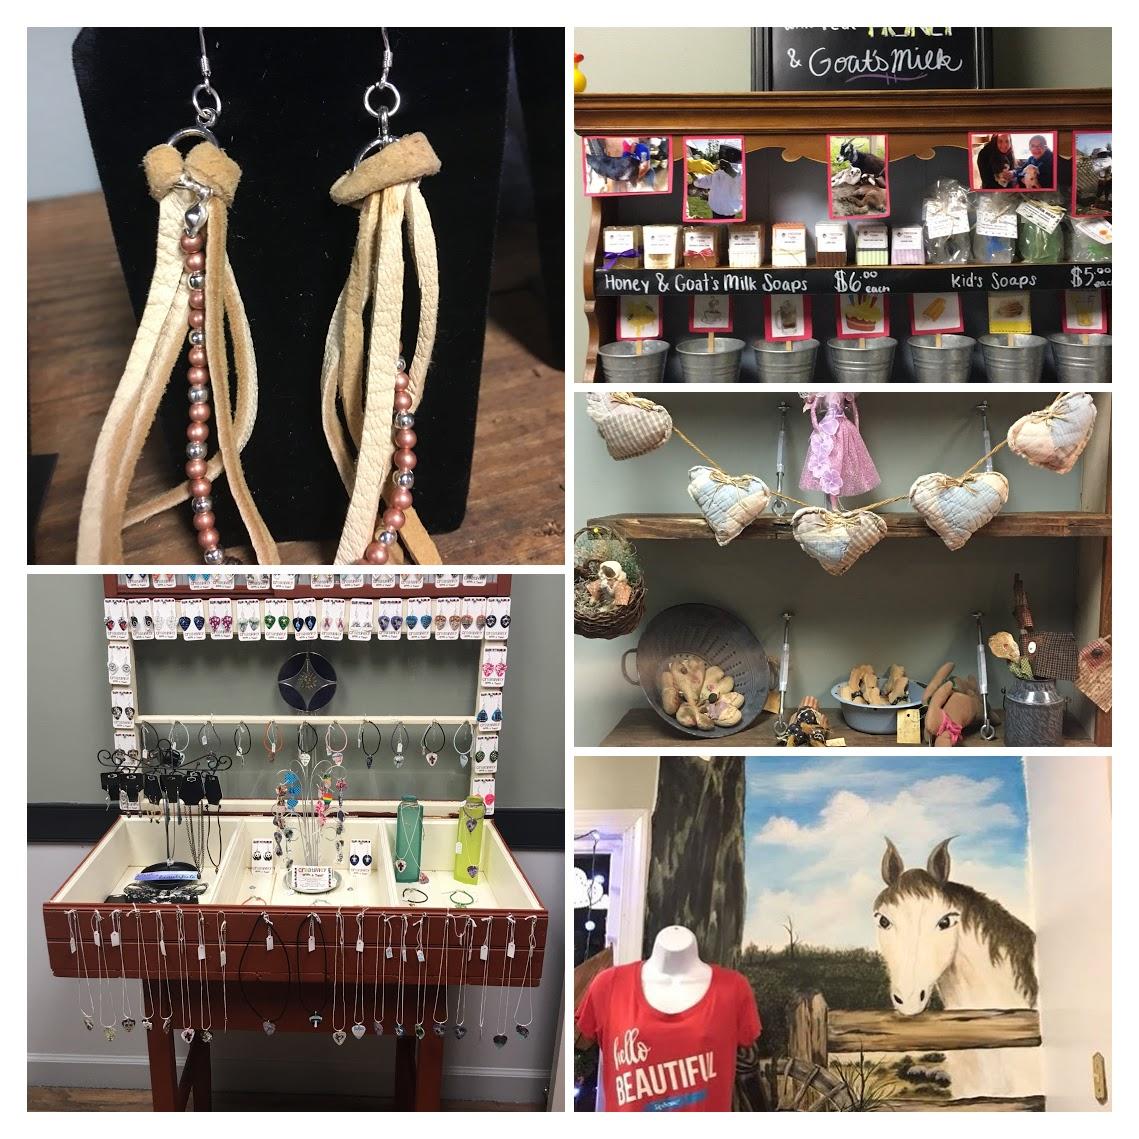 Bath and Body, wood working, jewelry, home decor, Open Mic Nights